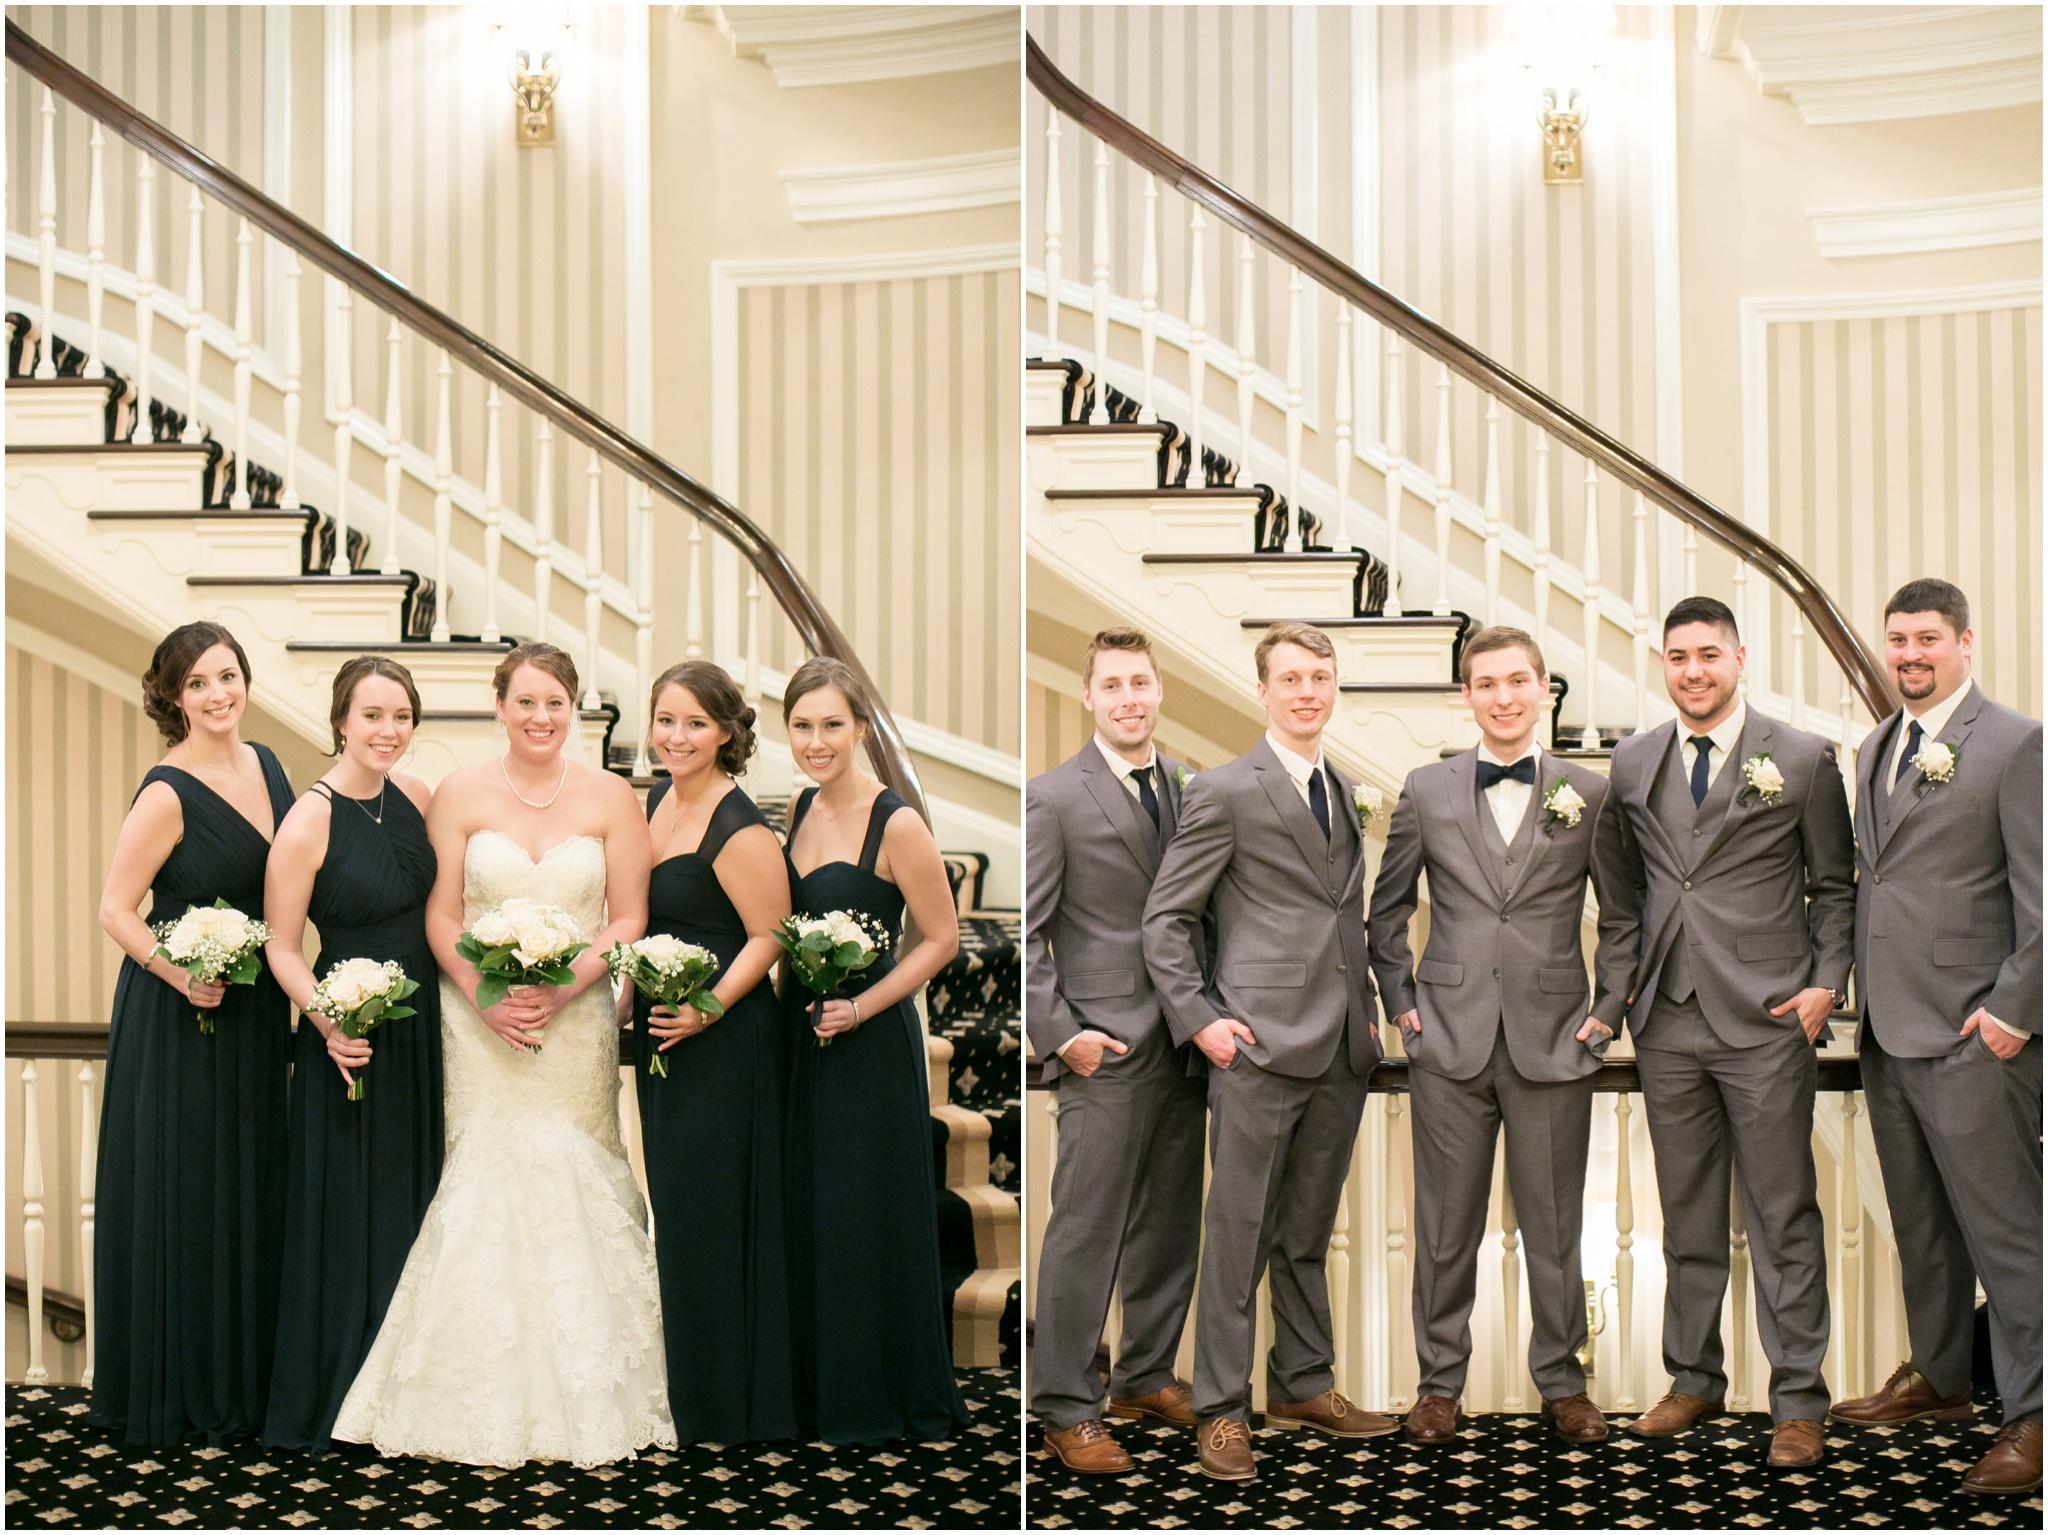 Madison_Club_Madison_Wisconsin_Wedding_Photographer_Spring_Rainy_Wedding_2604.jpg